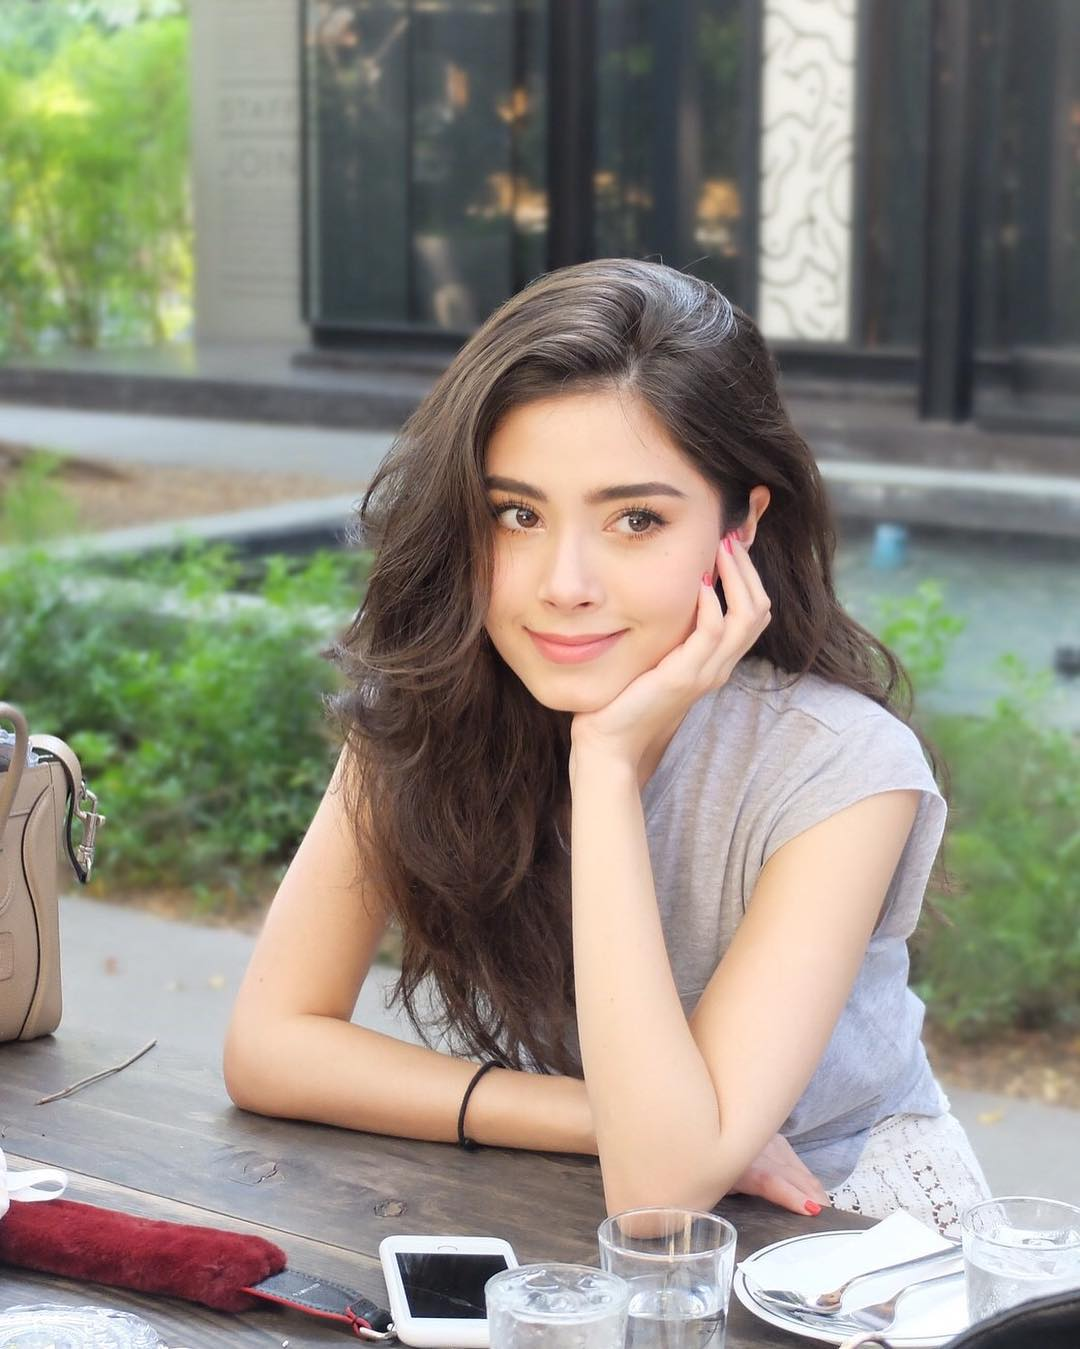 tai khoan instagram hot girl thai lan - nicolekittivat - elle man 3